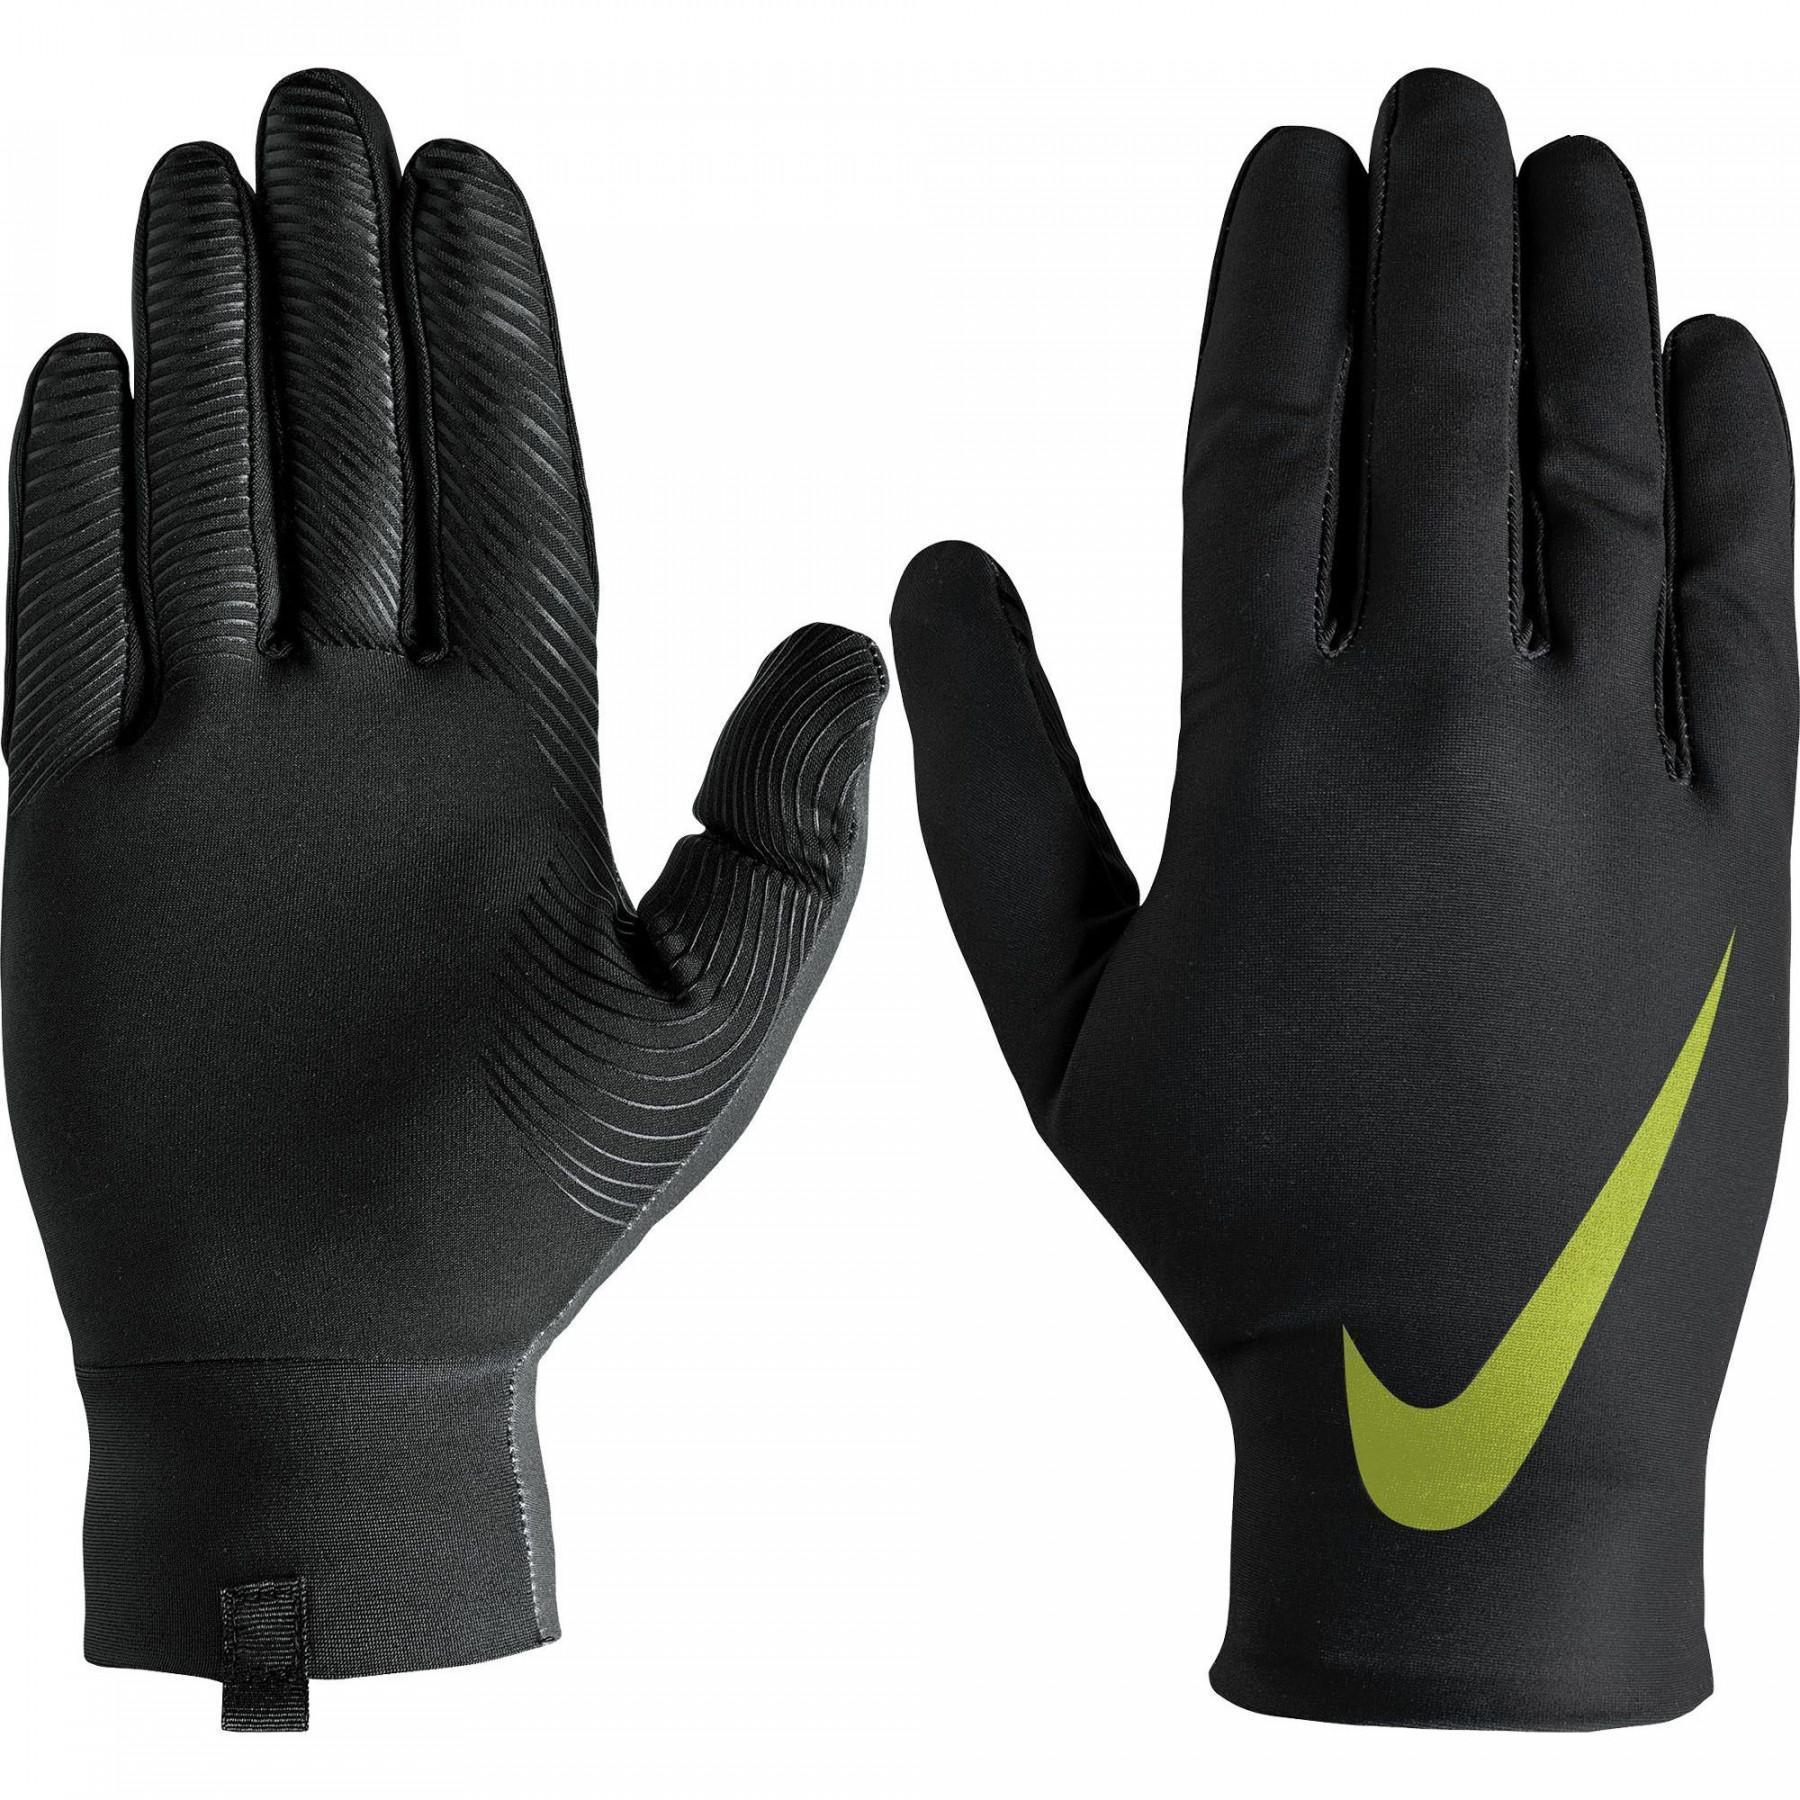 Women's gloves Nike base layer